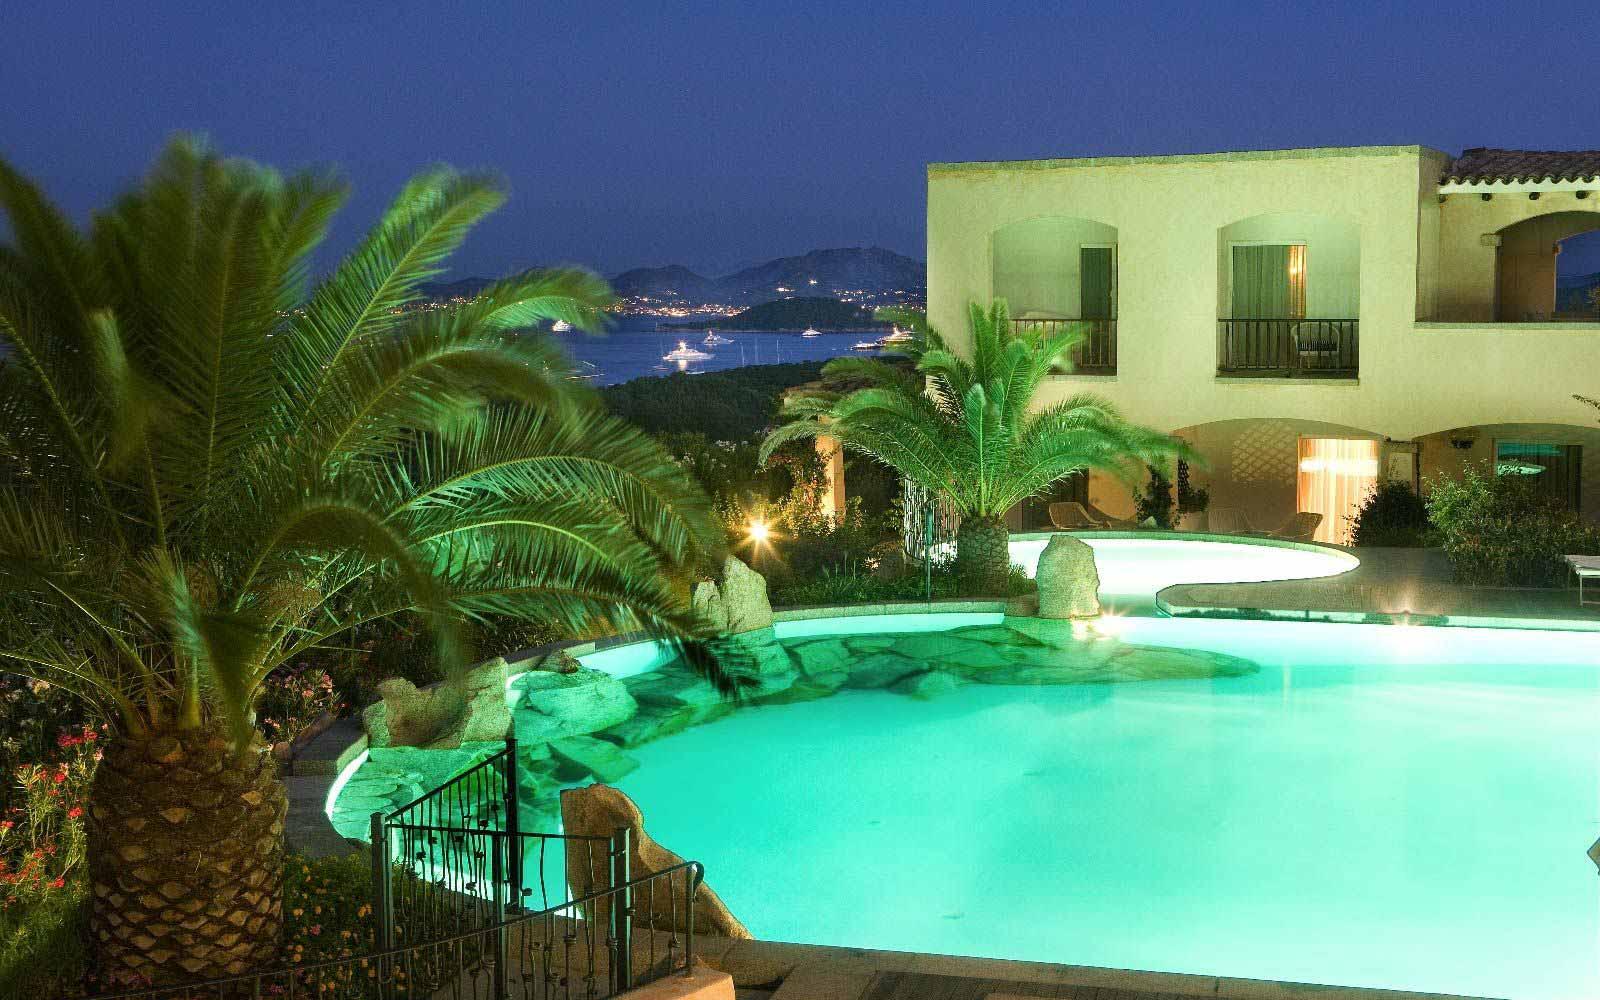 Hotel Petra Bianca at night